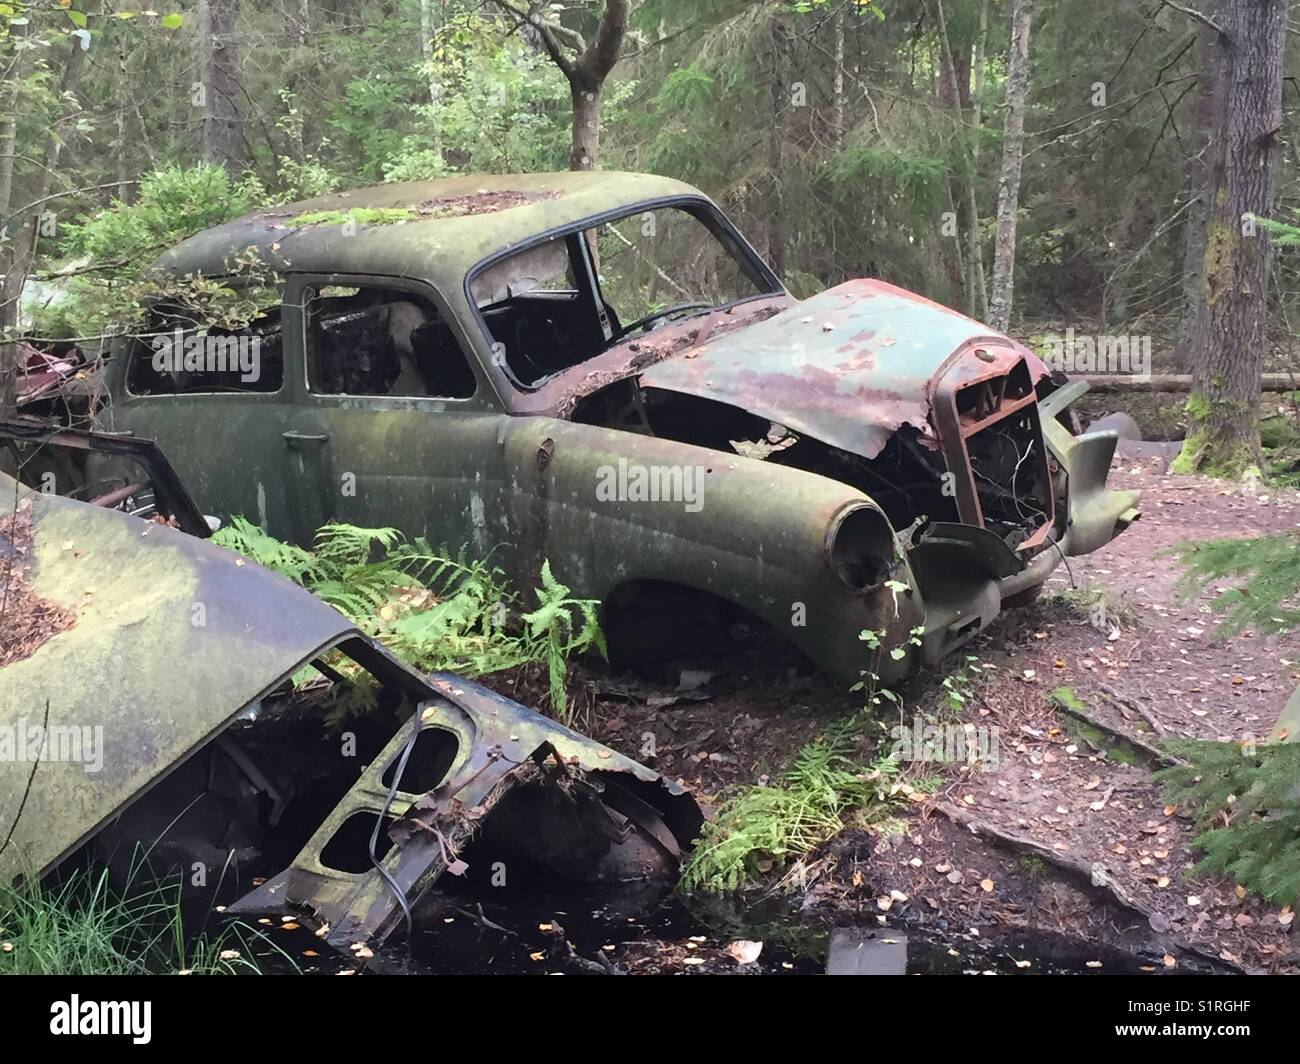 Scrap car park. - Stock Image